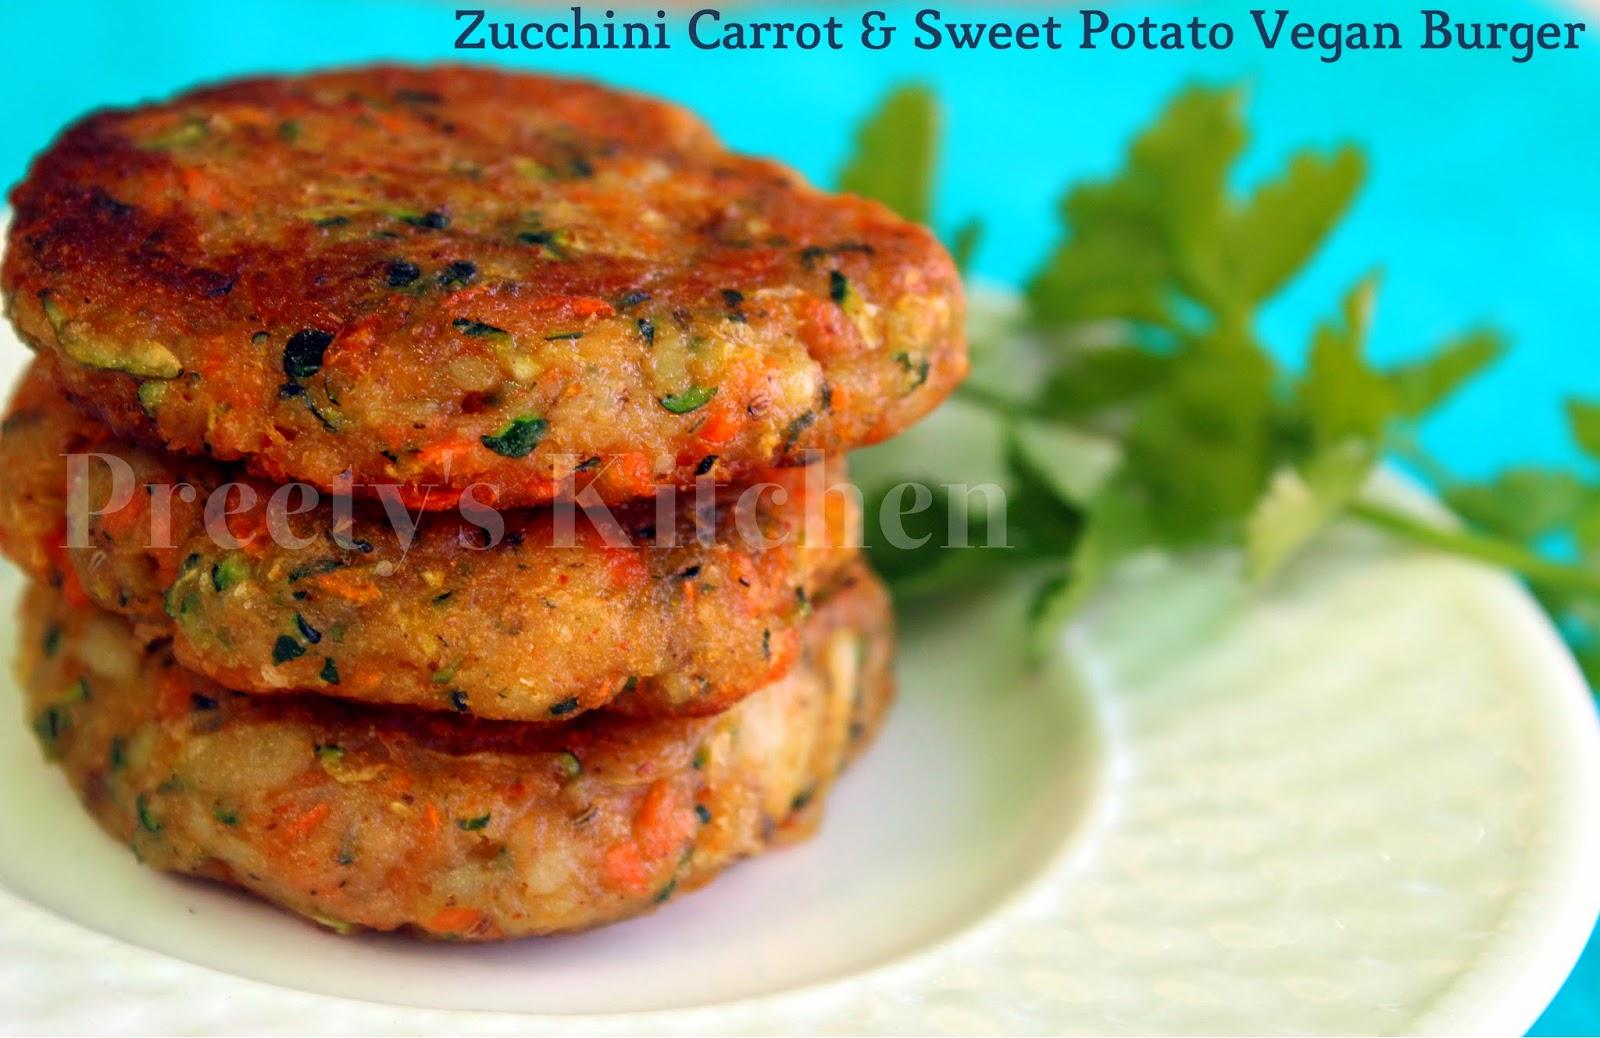 Preetys kitchen zucchini carrot sweet potato vegan burger zucchini carrot sweet potato vegan burger patty tikki forumfinder Images